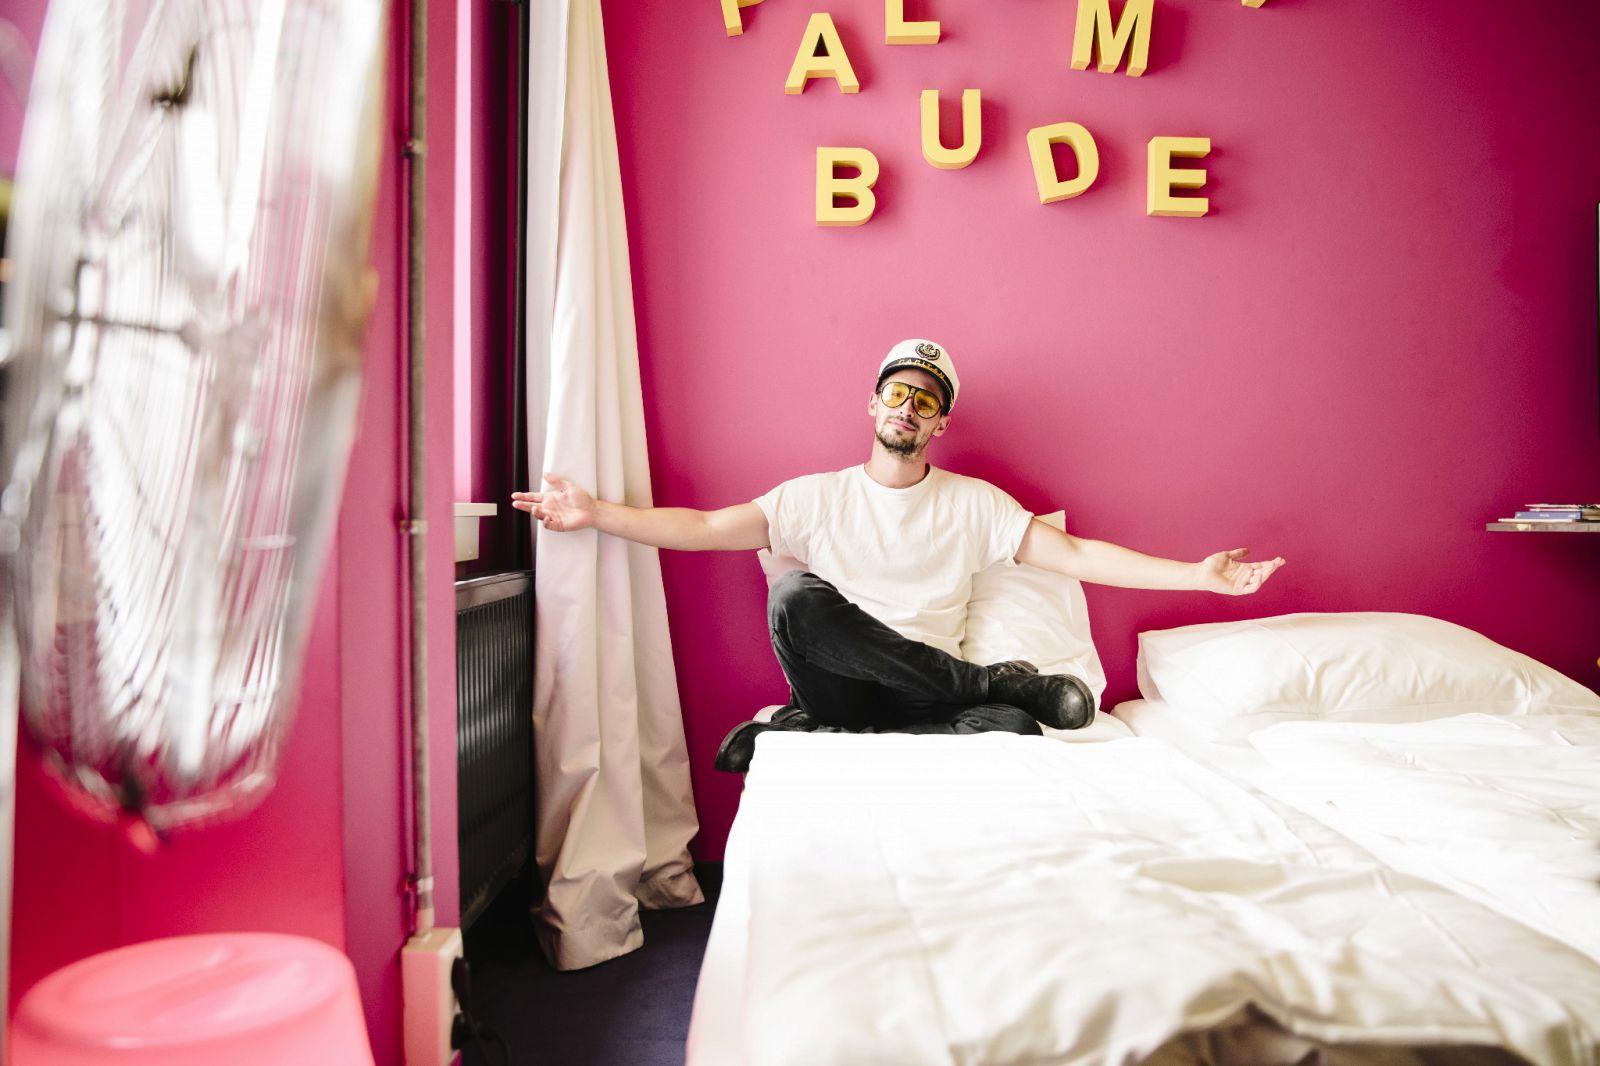 palomabude studio for up to 6 people hostel hamburg st georg superbude. Black Bedroom Furniture Sets. Home Design Ideas